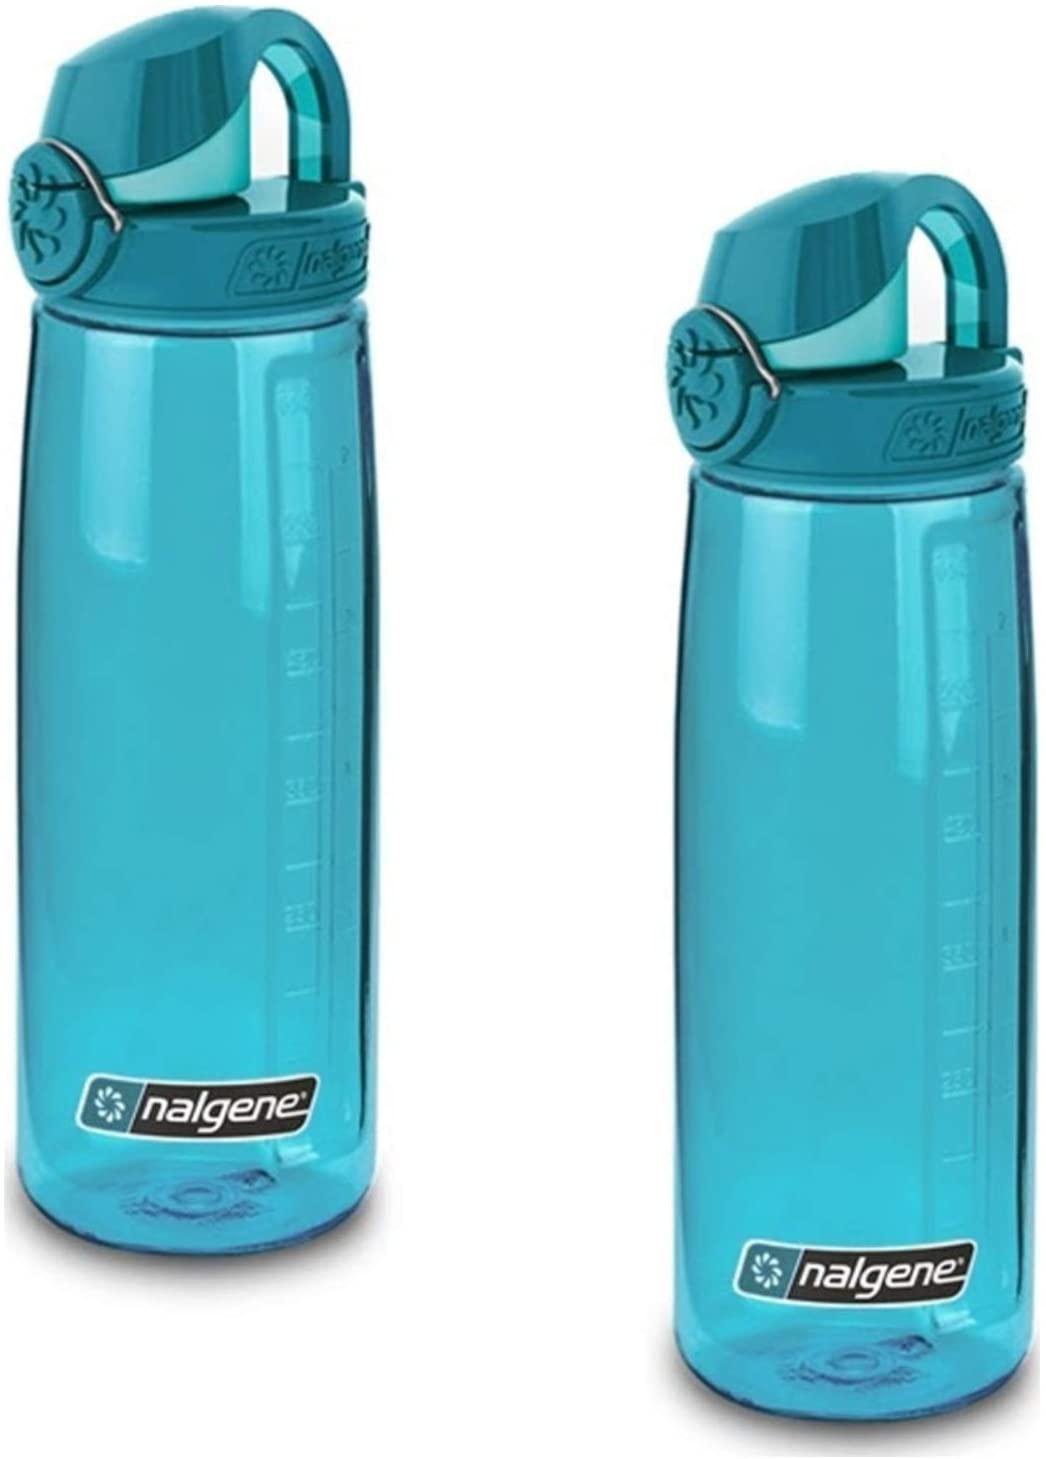 Nalgene On The Fly 24 oz Water Bottle Blue w/Glacial Blue Cap - 2 Pack